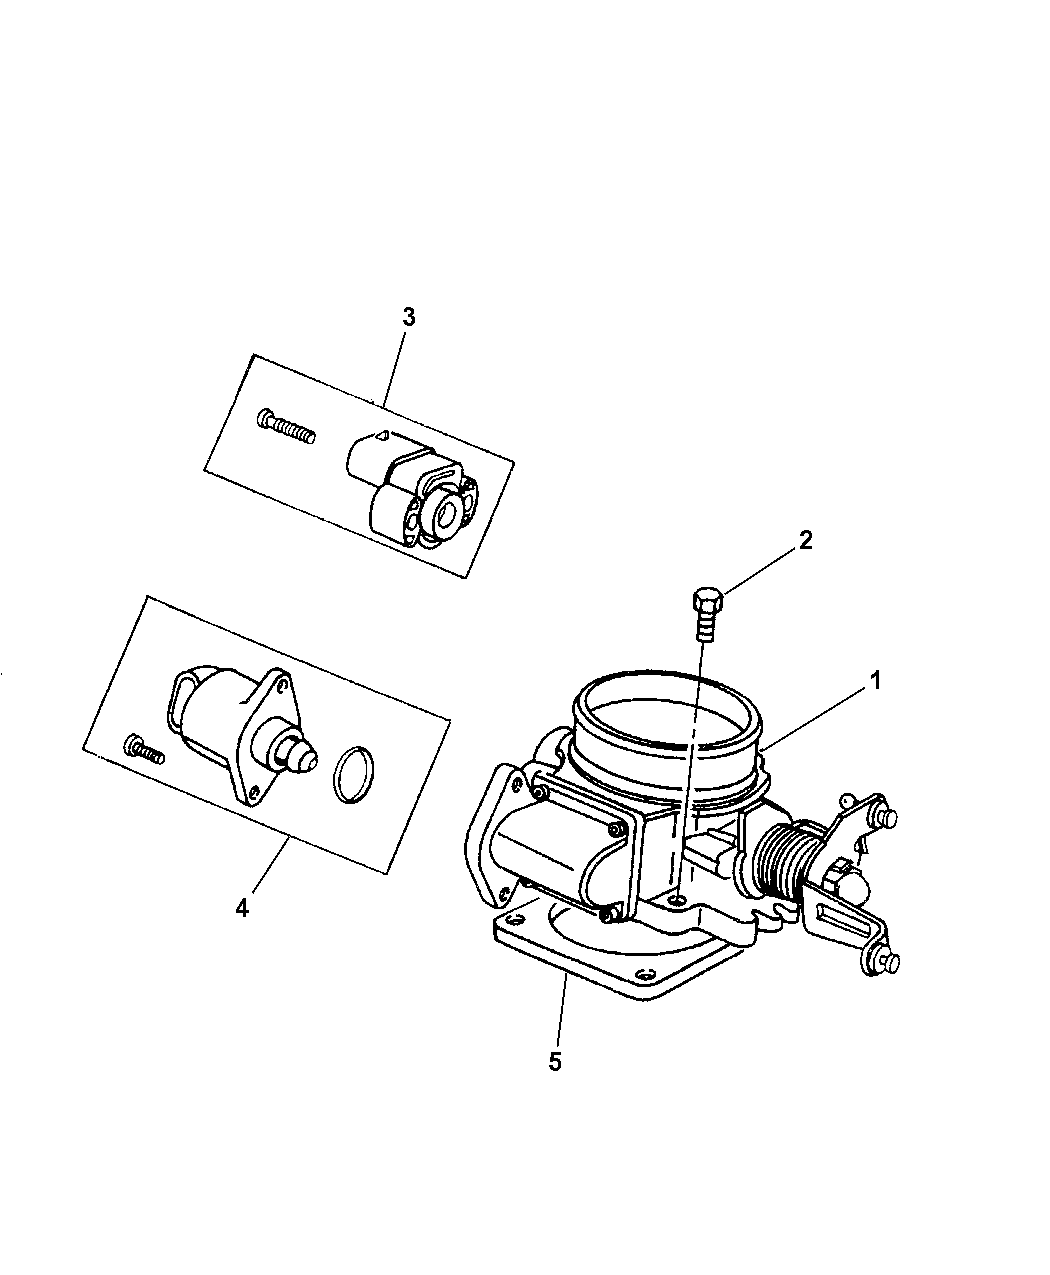 1997 Jeep Wrangler Throttle Body - Mopar Parts Giant